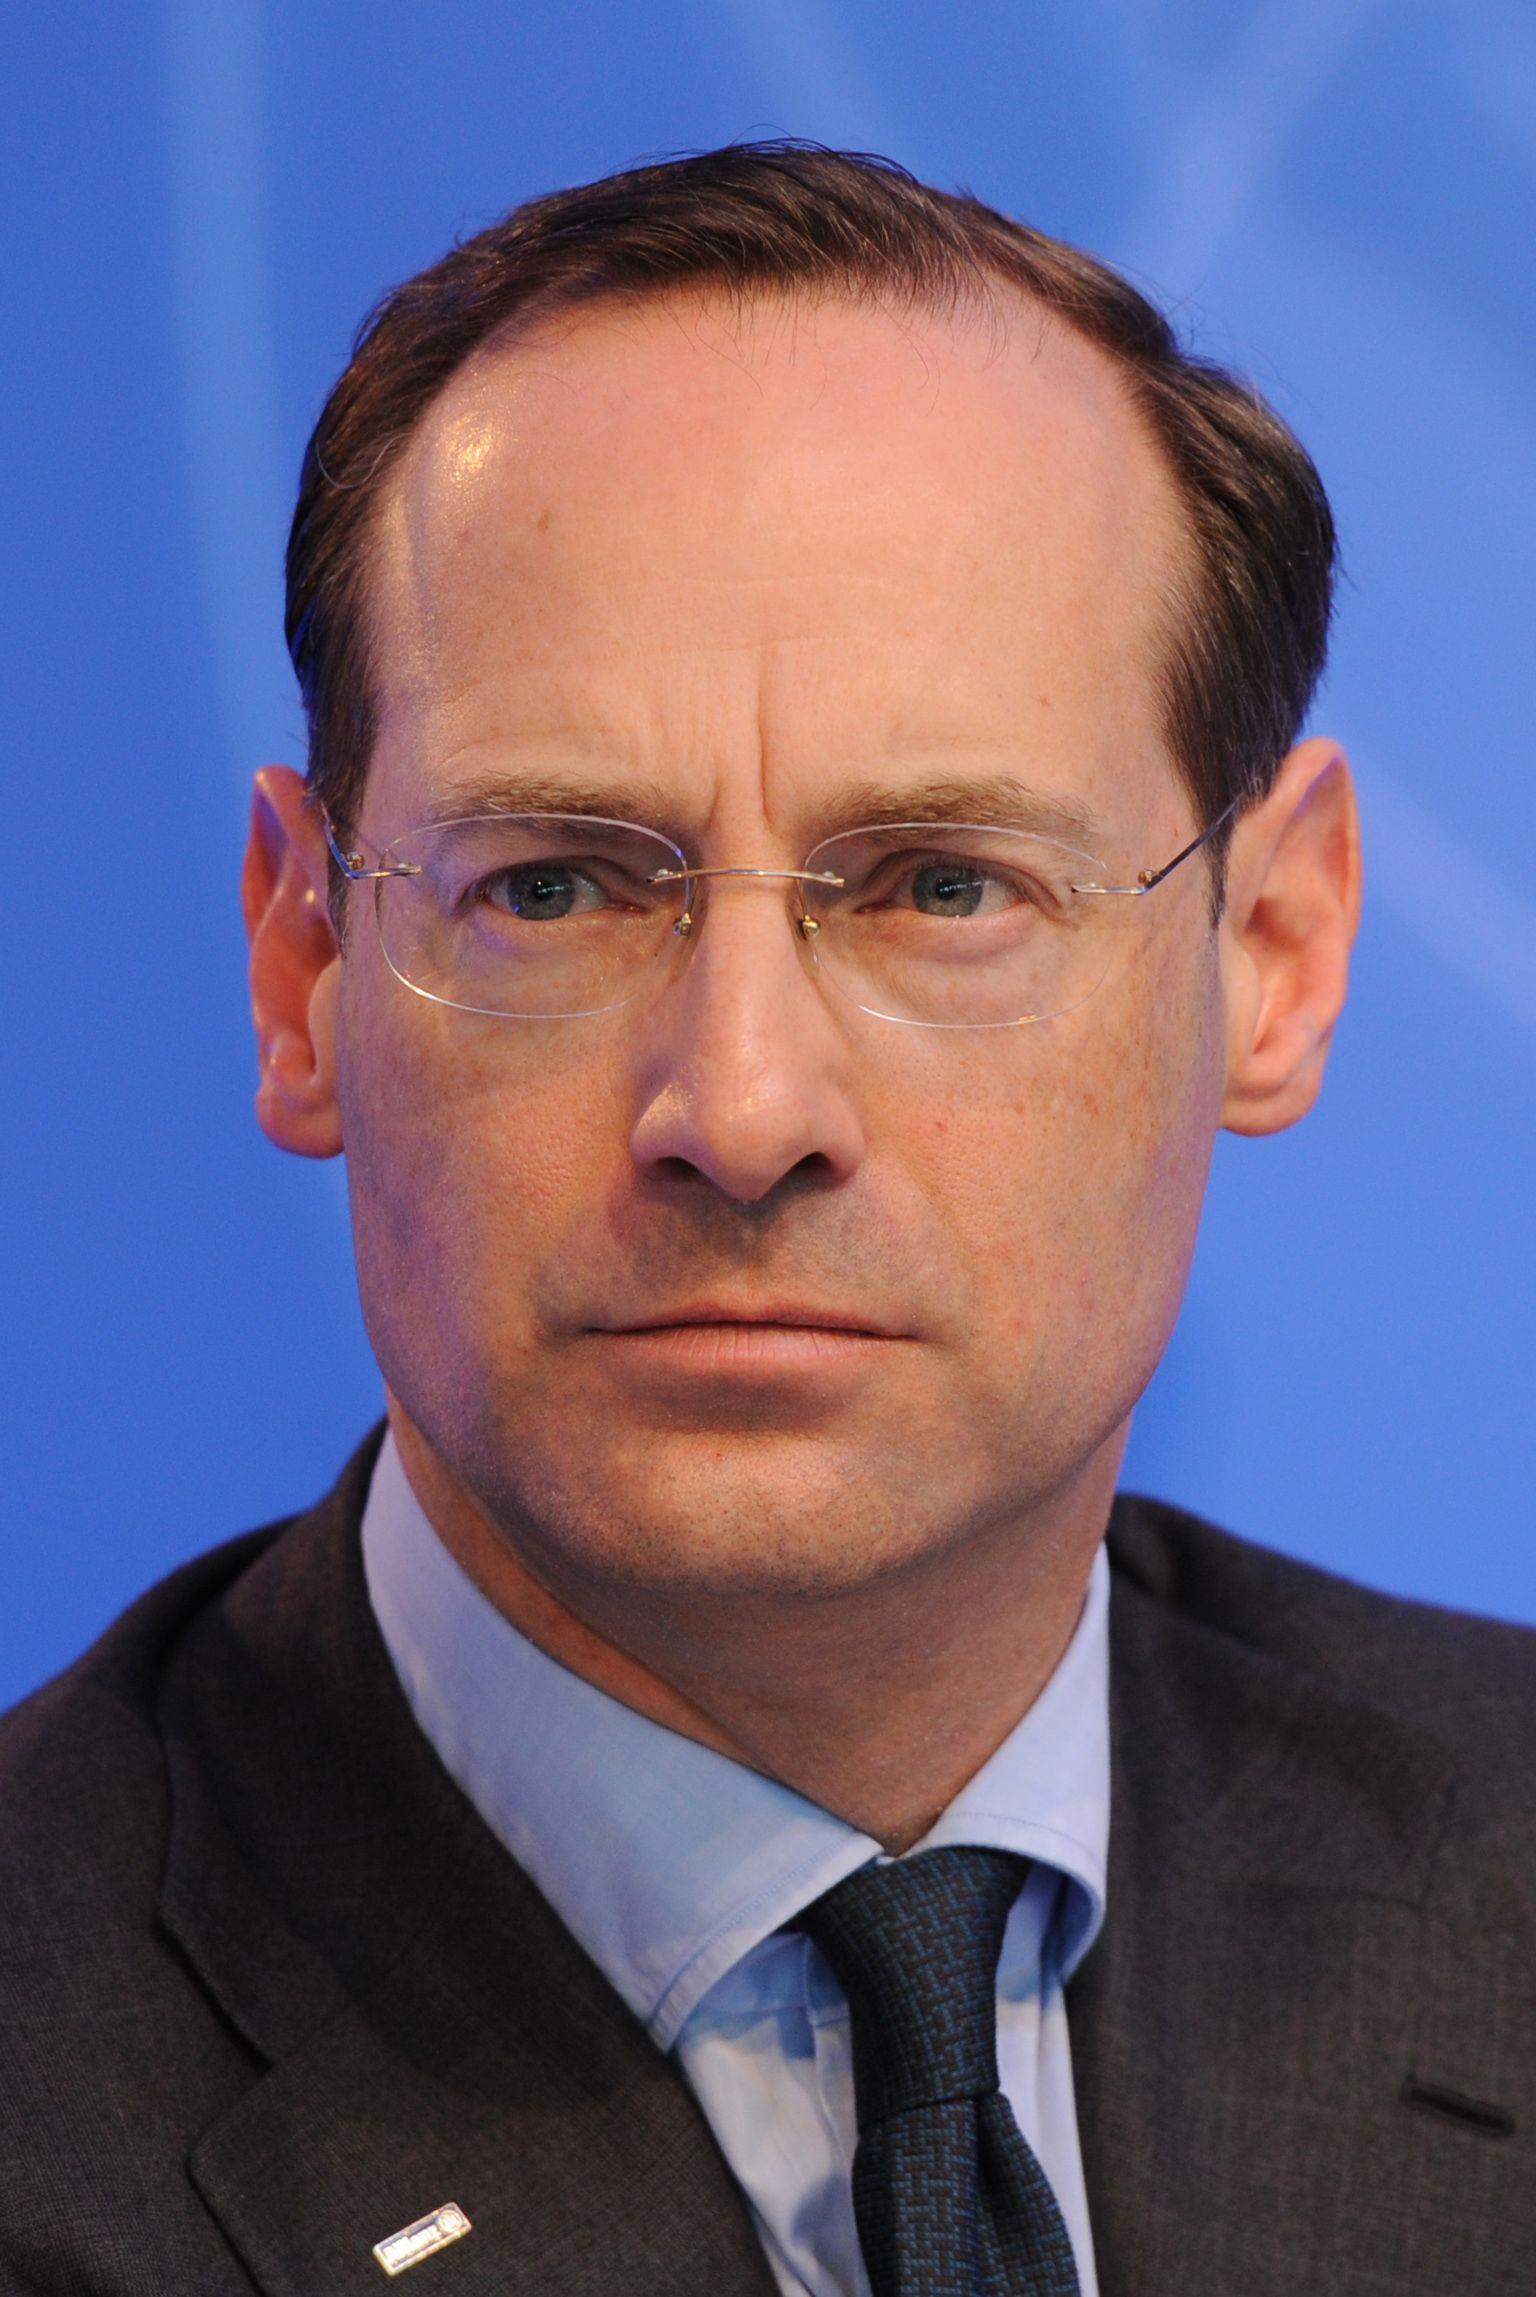 Oliver Bäte / Allianz / CFO